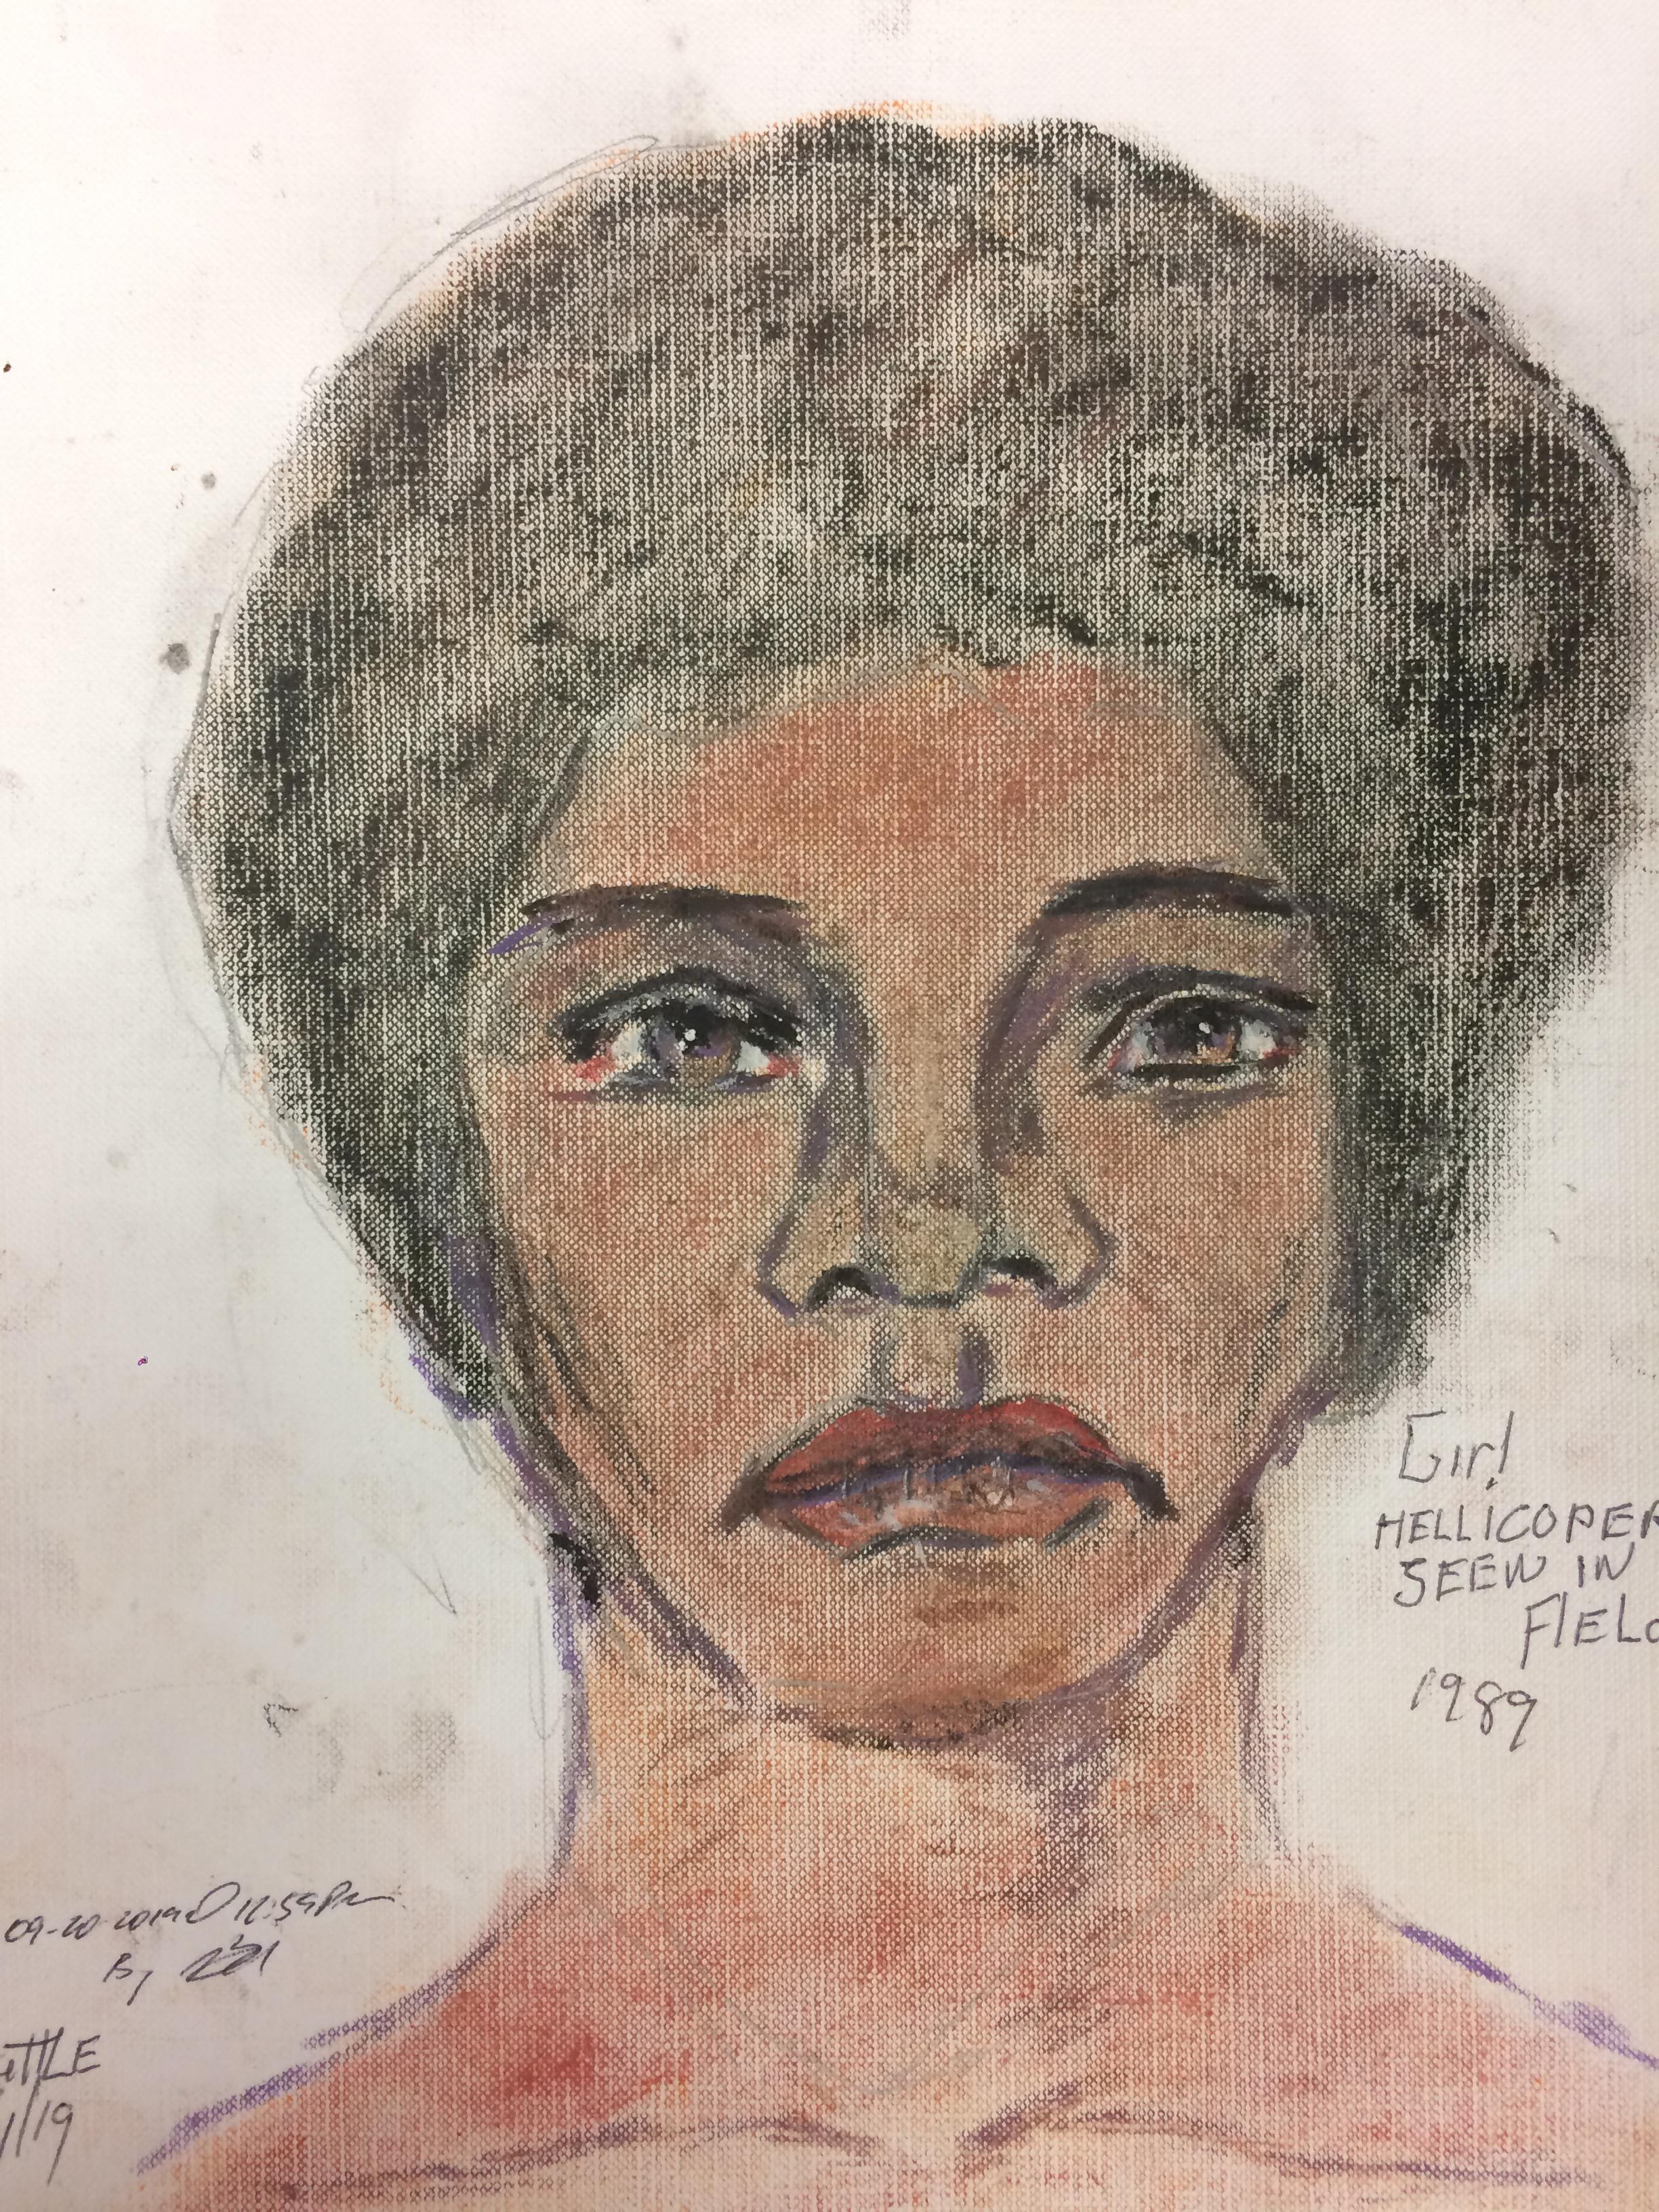 Samuel Little Drawing of Black Female Victim (Killed in 1992 or 1993, Los Angeles)